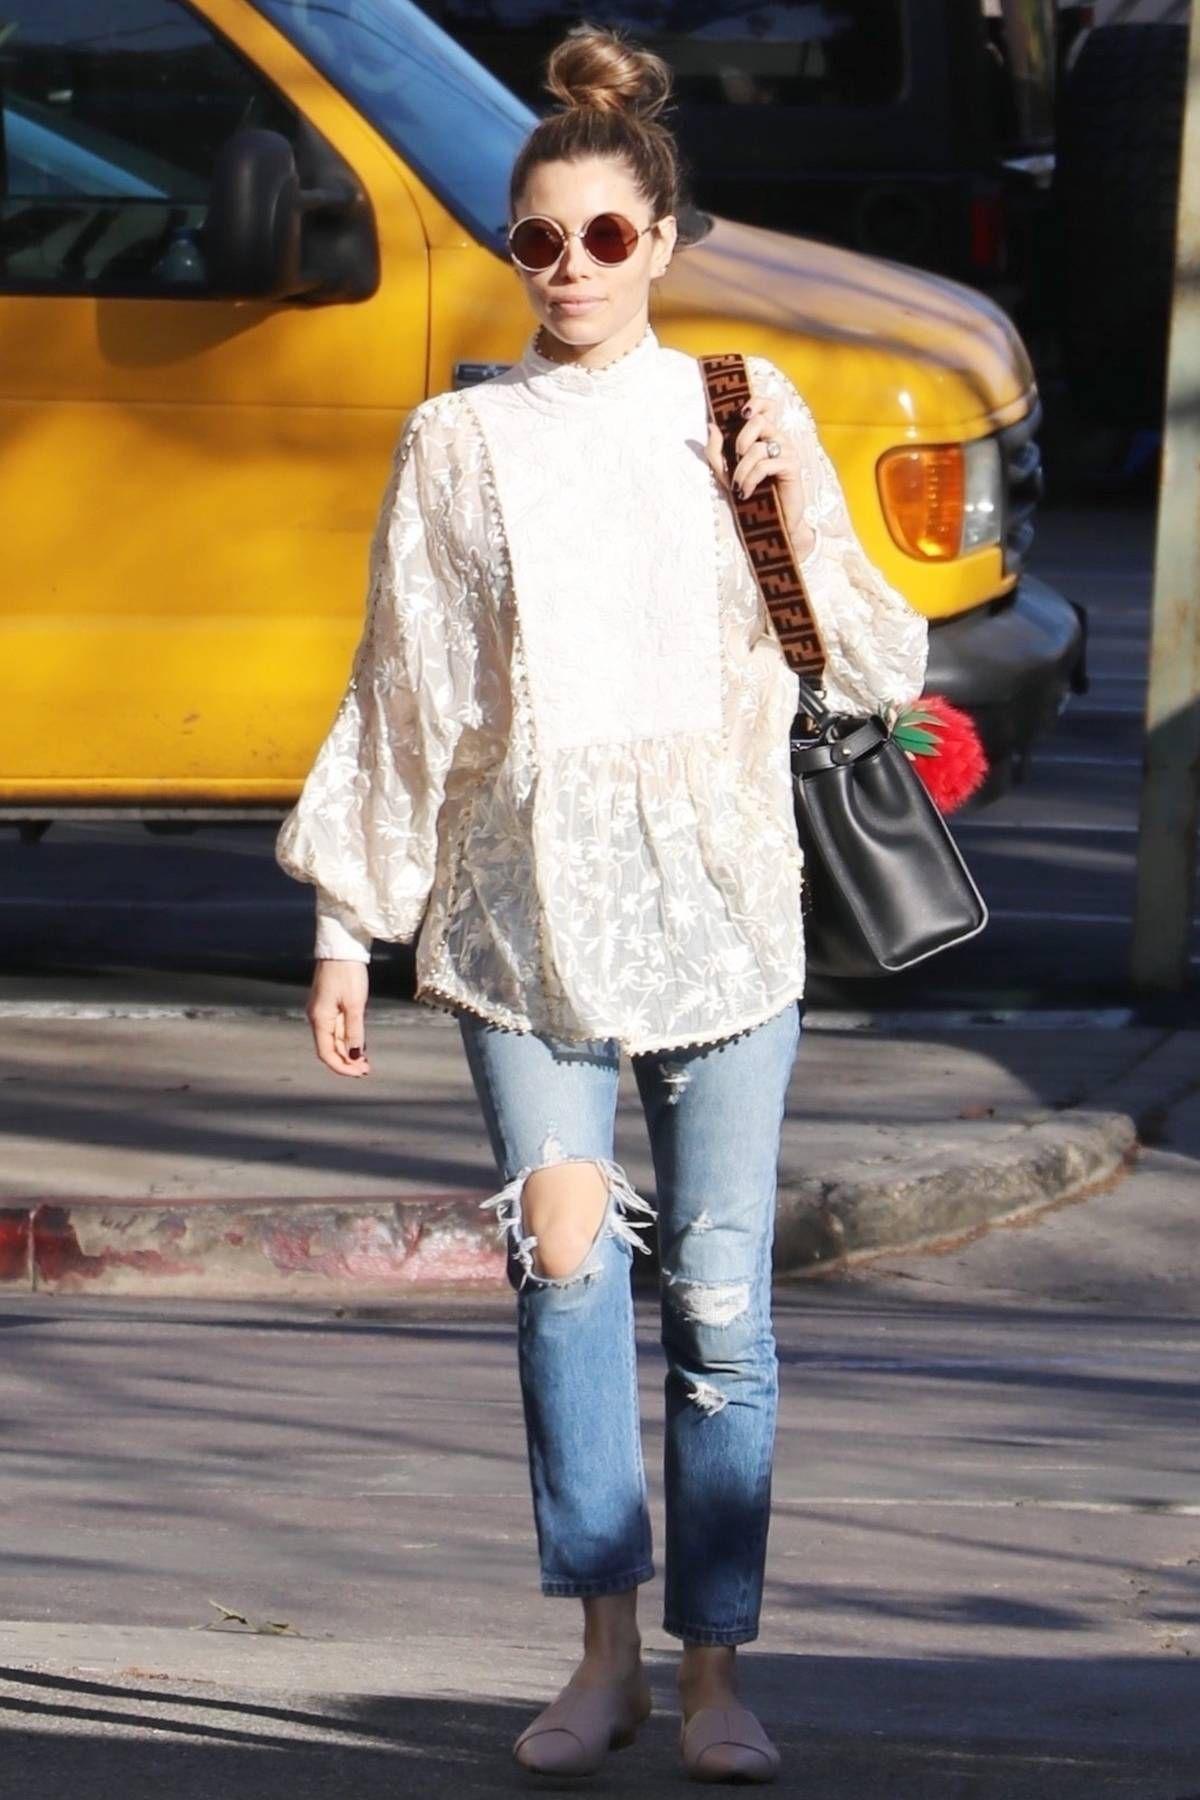 f2408c0fc5 The Coolest Ways to Wear Boyfriend Jeans Now in 2019